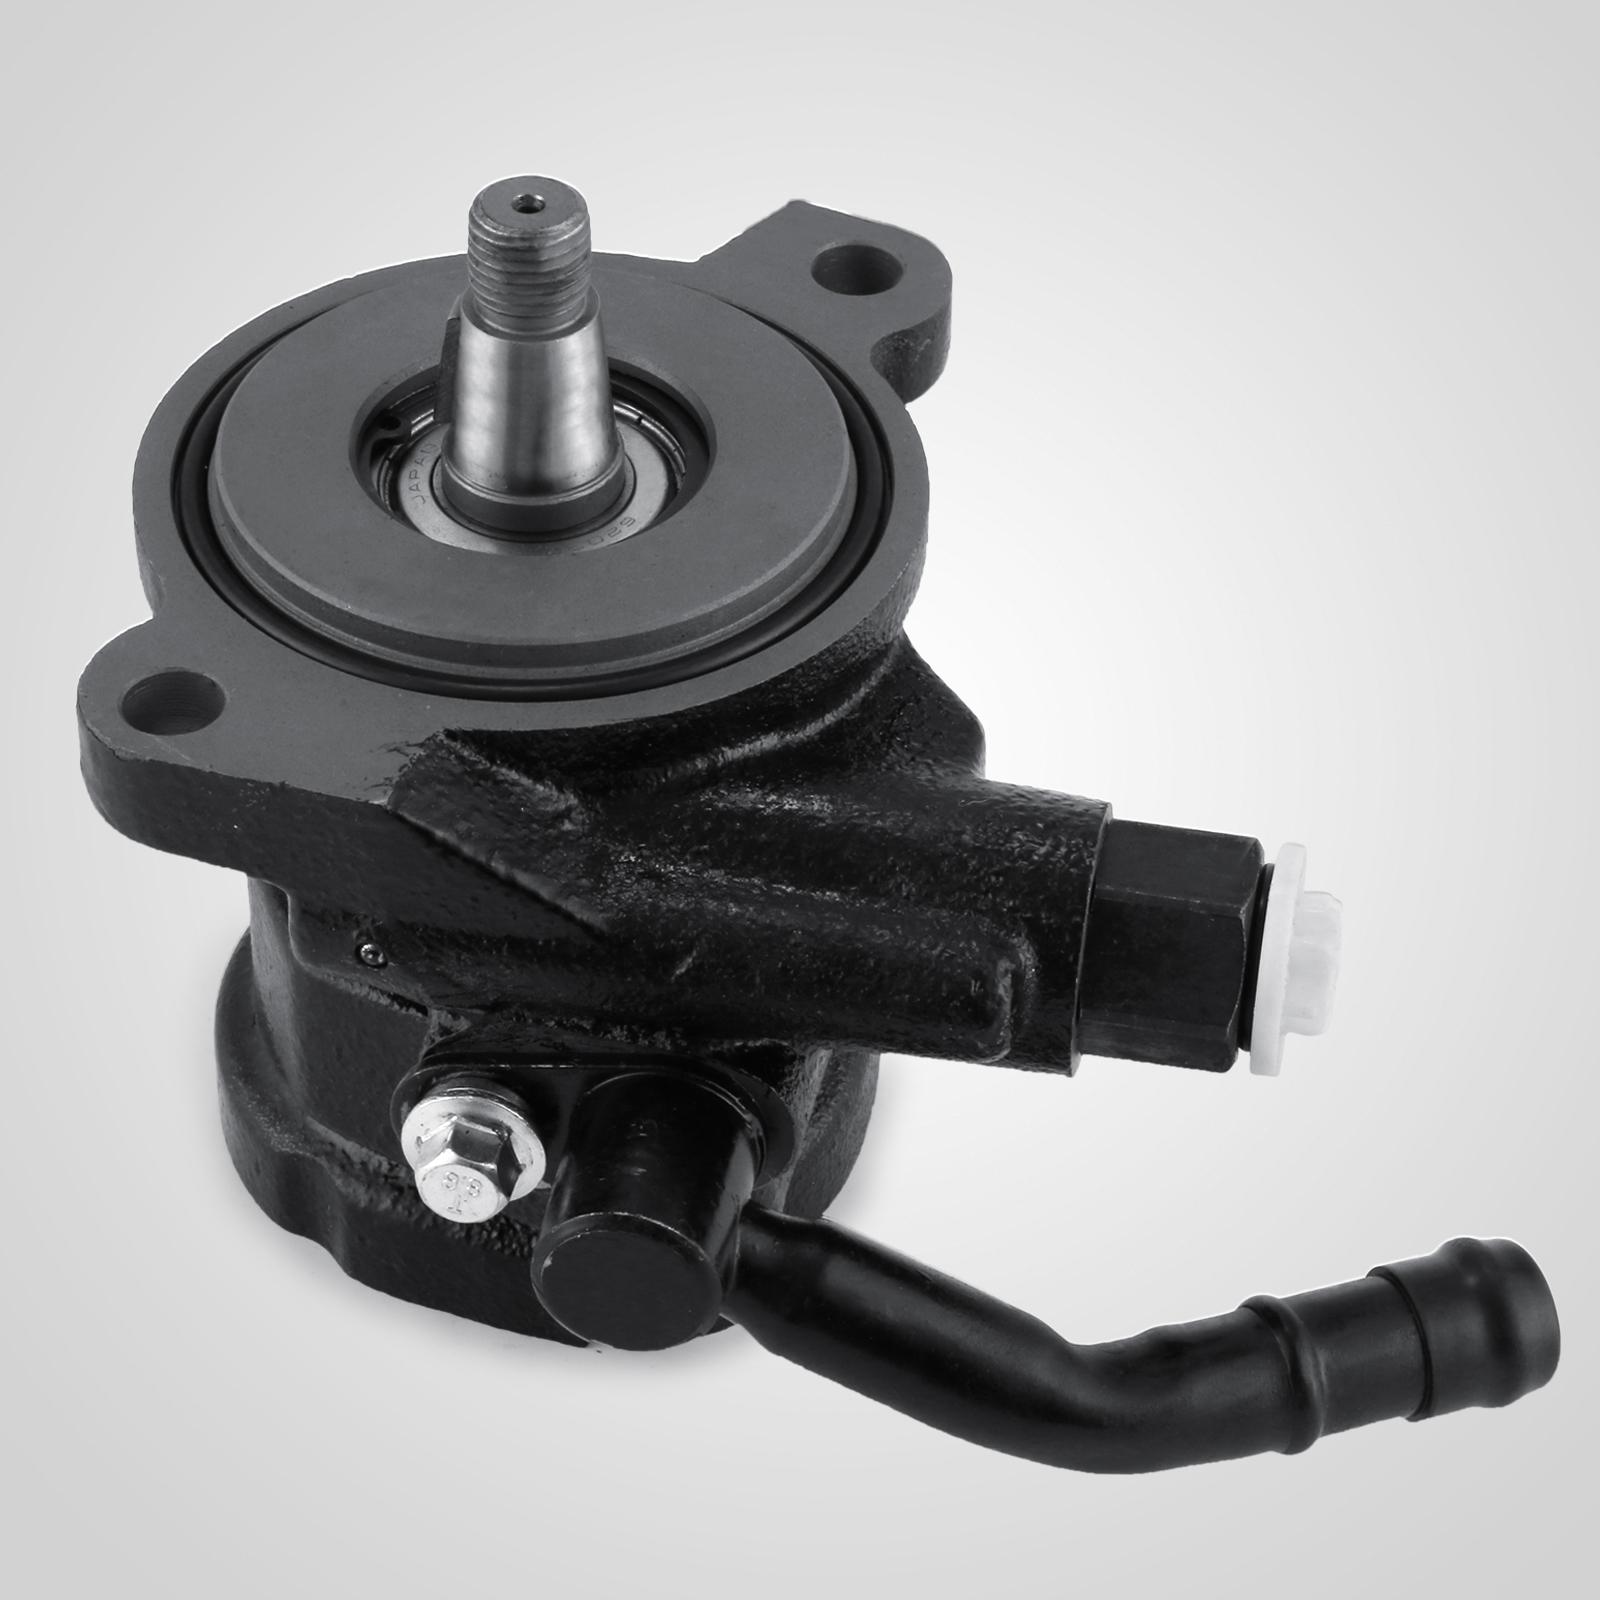 LANDCRUISER POWER STEERING PUMP fits HDJ80 HZJ80 HJ80  DSL 4.2L 05//90-03//98